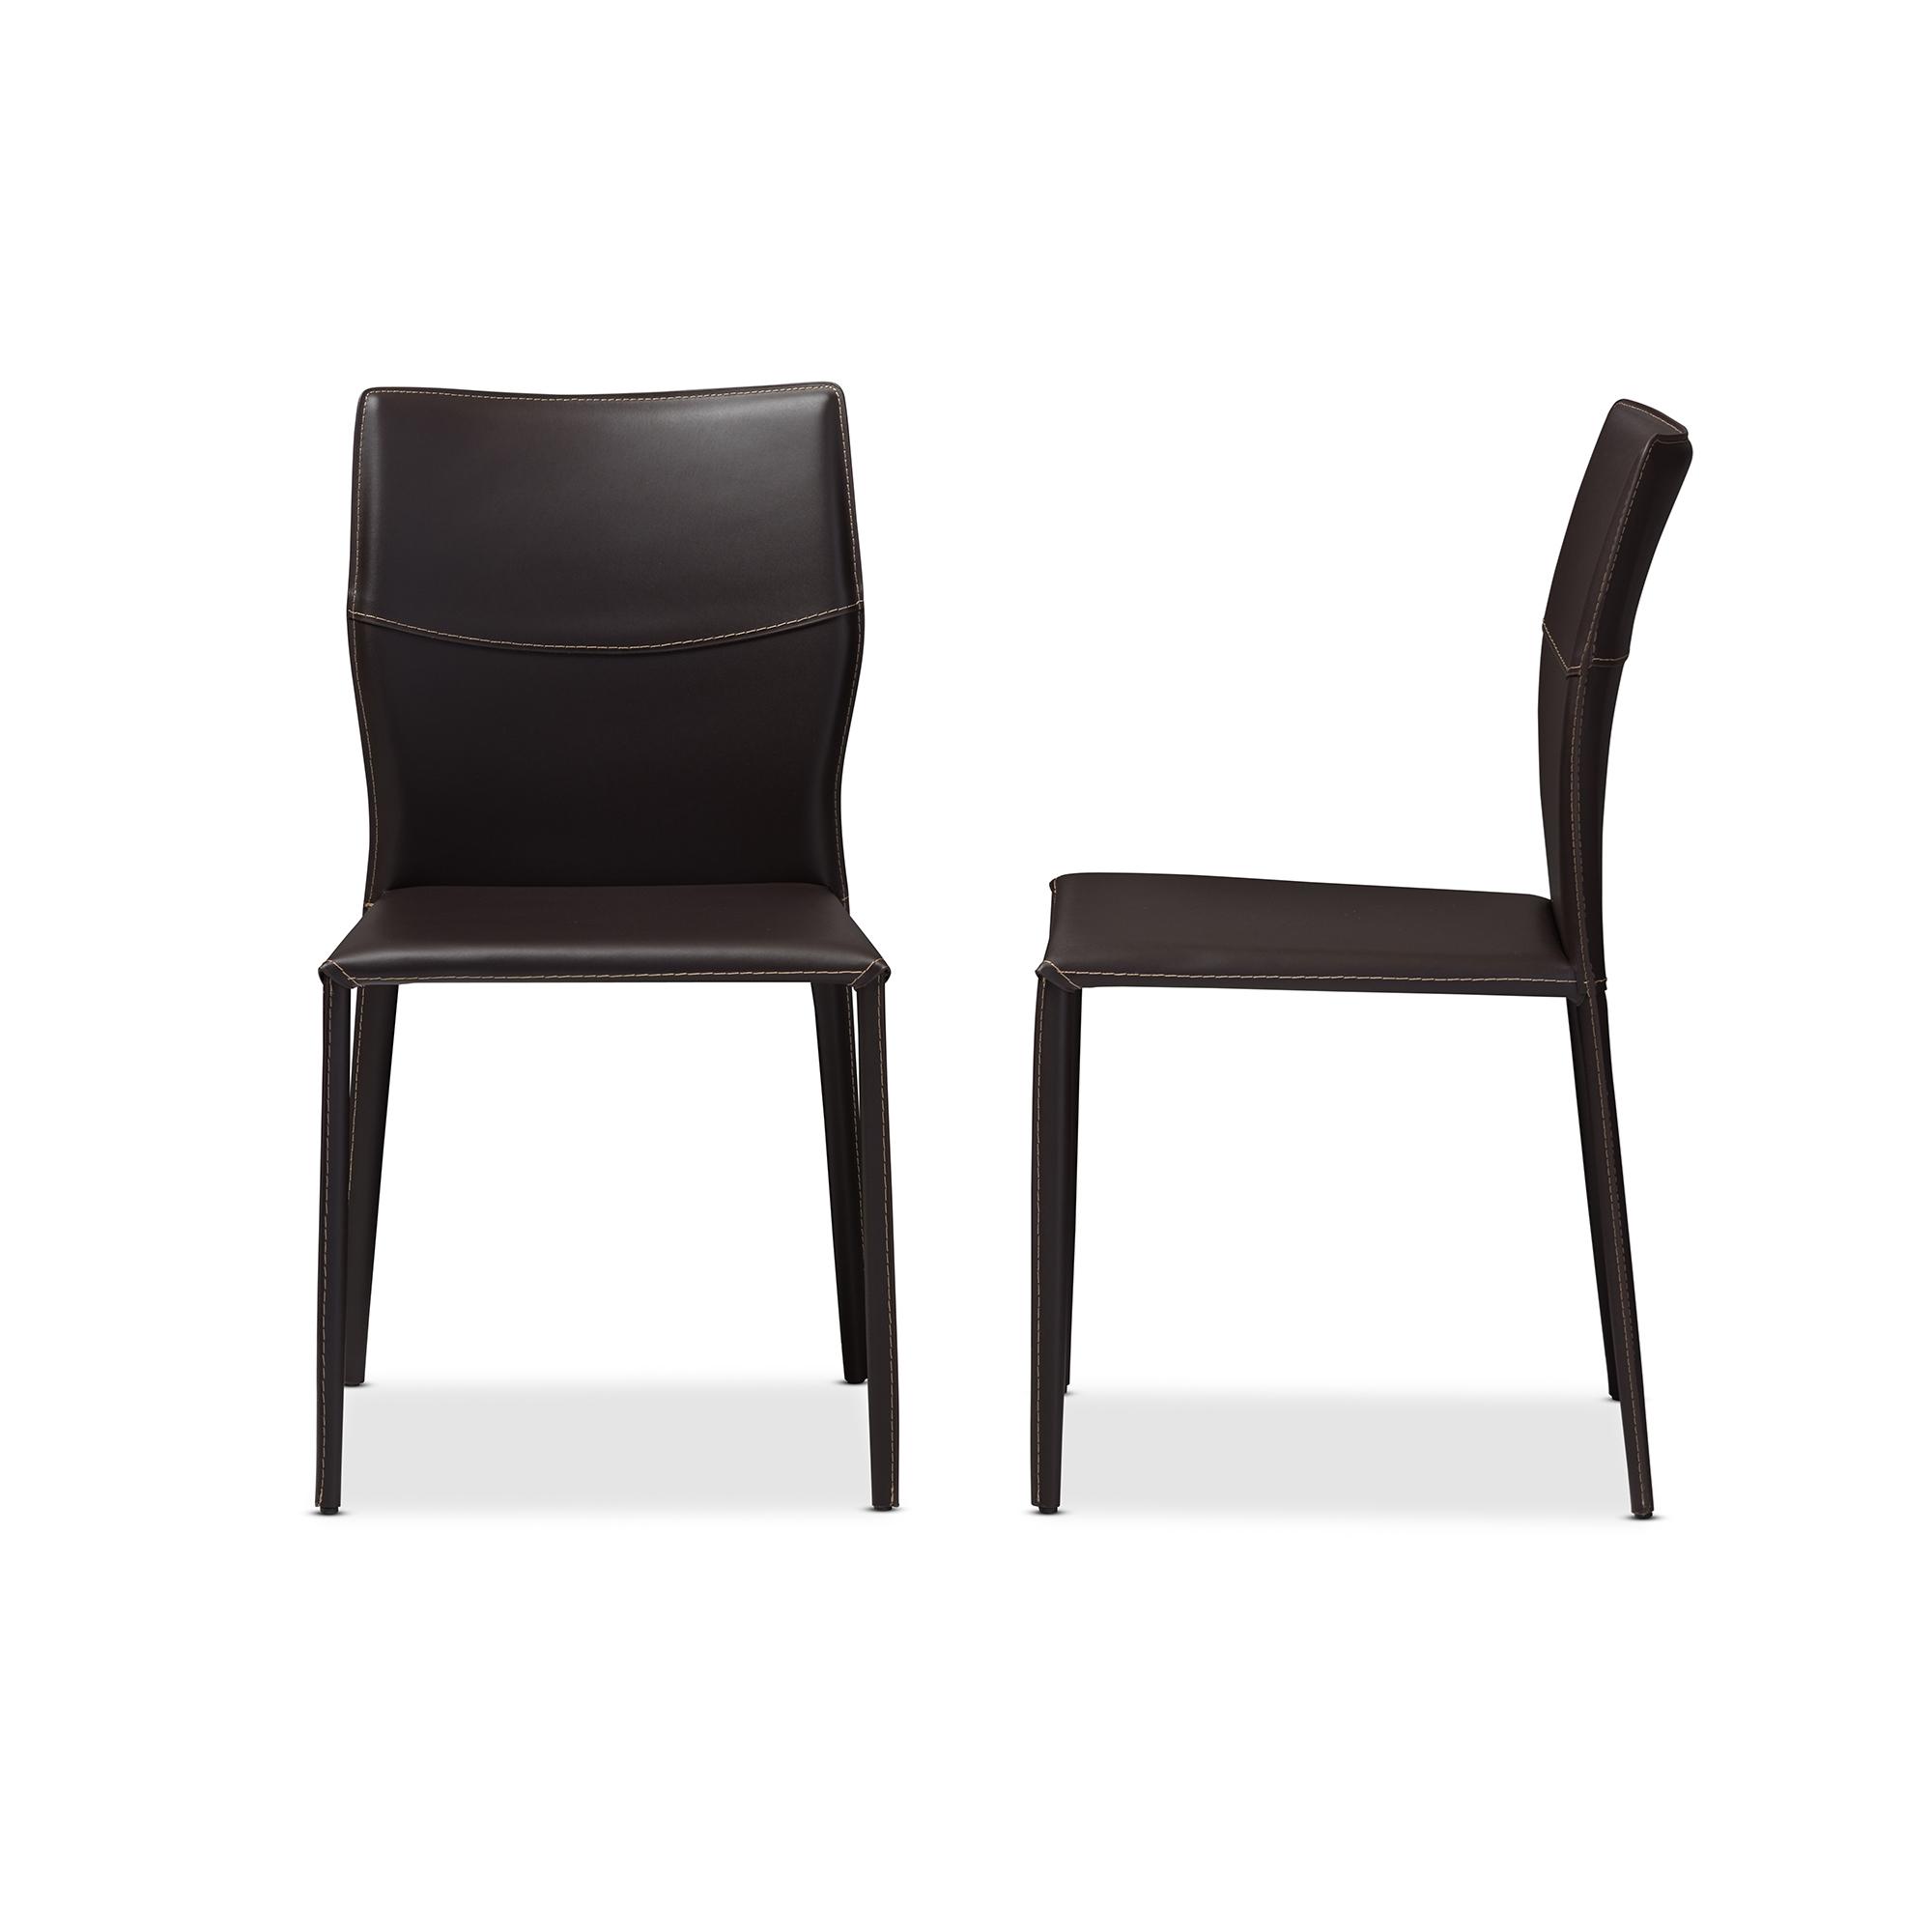 Modern restaurant chairs - Cool Baxton Studio Asper Modern And Dark Brown Bonded Leather Upholstered Dining Chair Baxton Studio Restaurant With Restaurant Chairs Cheap